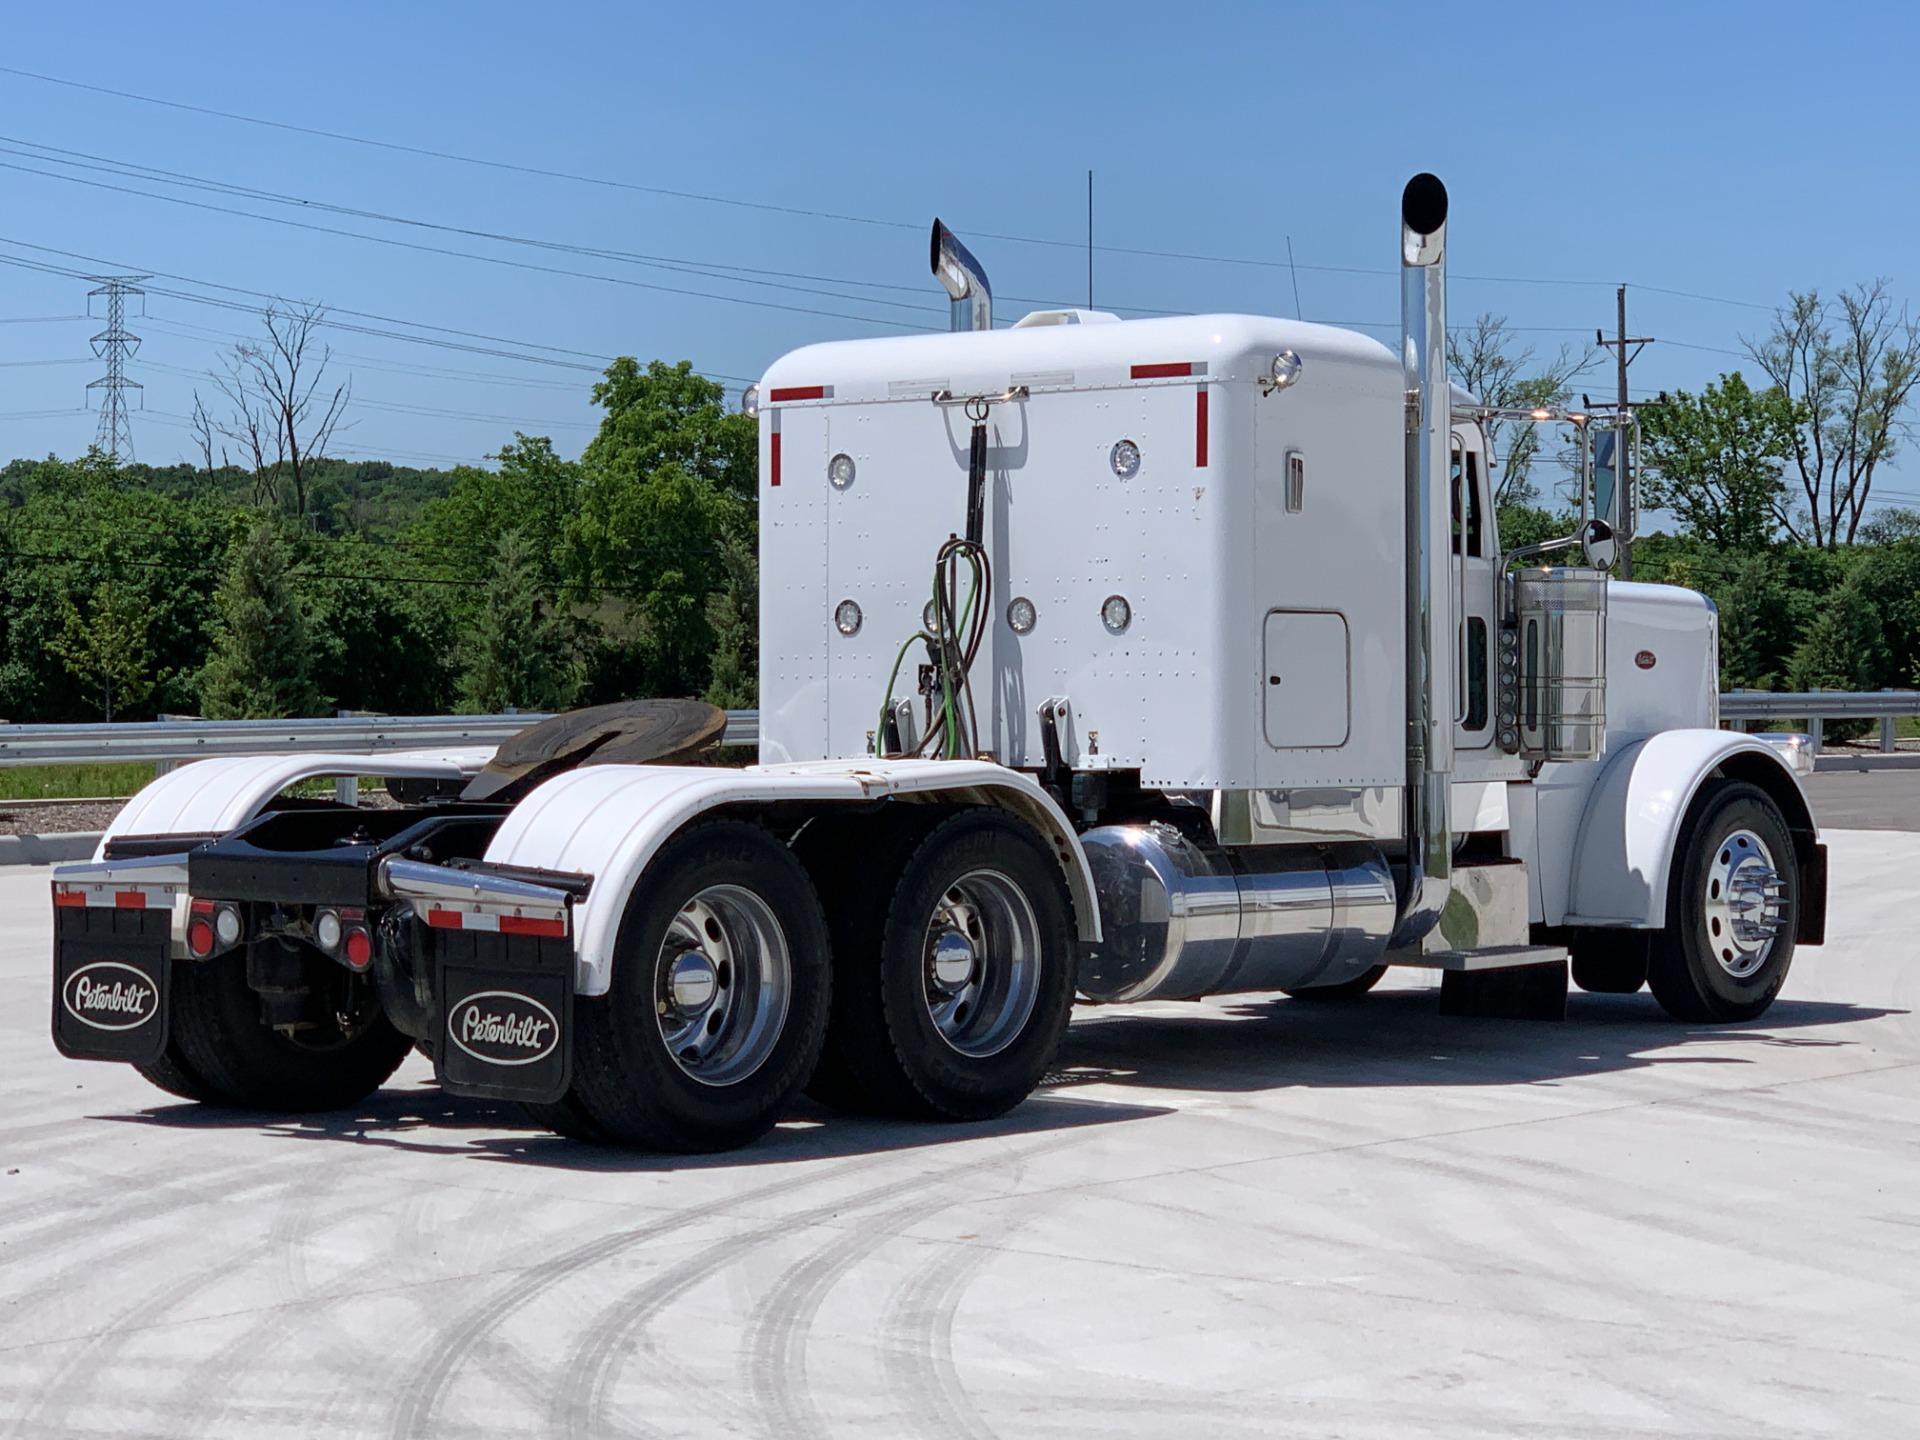 Used-2012-Peterbilt-389-SLEEPER-CANADIAN-REGISTERED-GLIDER-Detroit-Series-60-500-HP